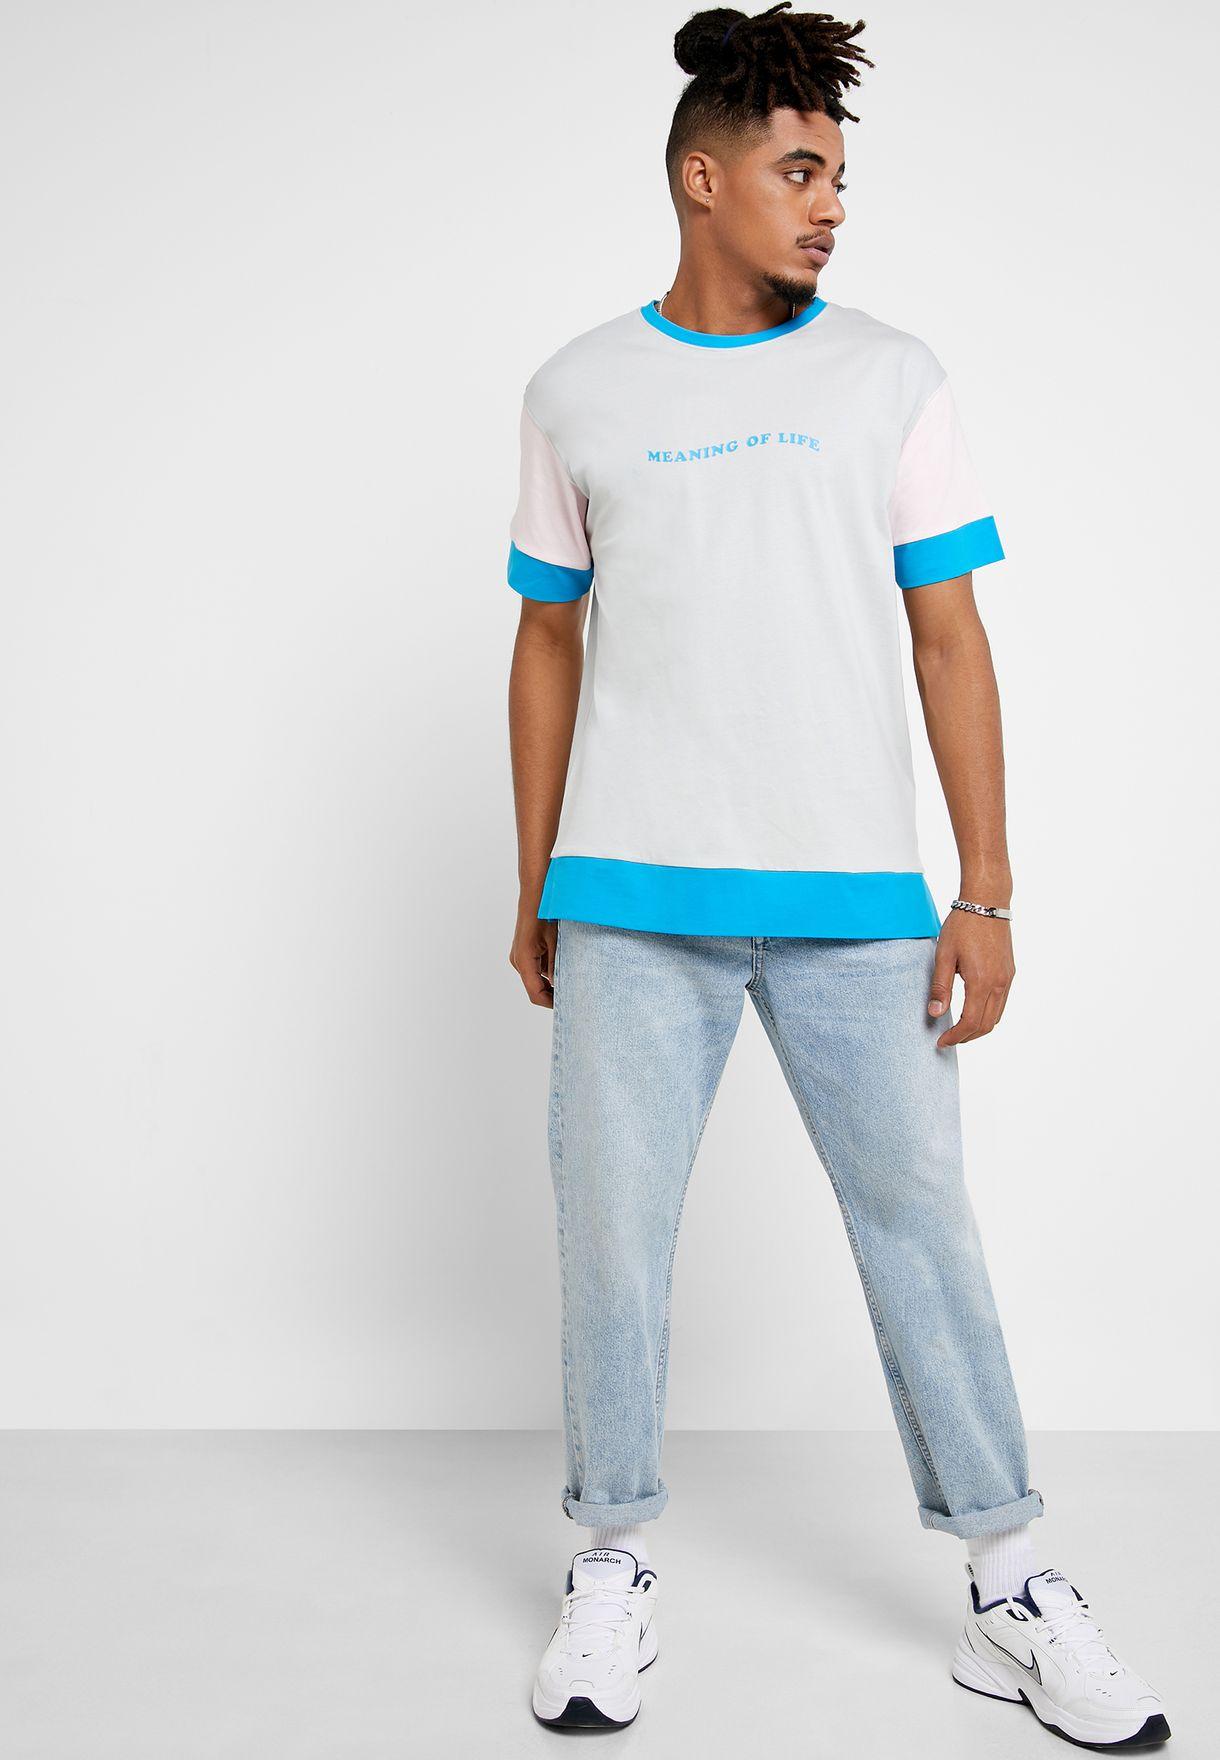 Coop Of Life Semi Box T-Shirt